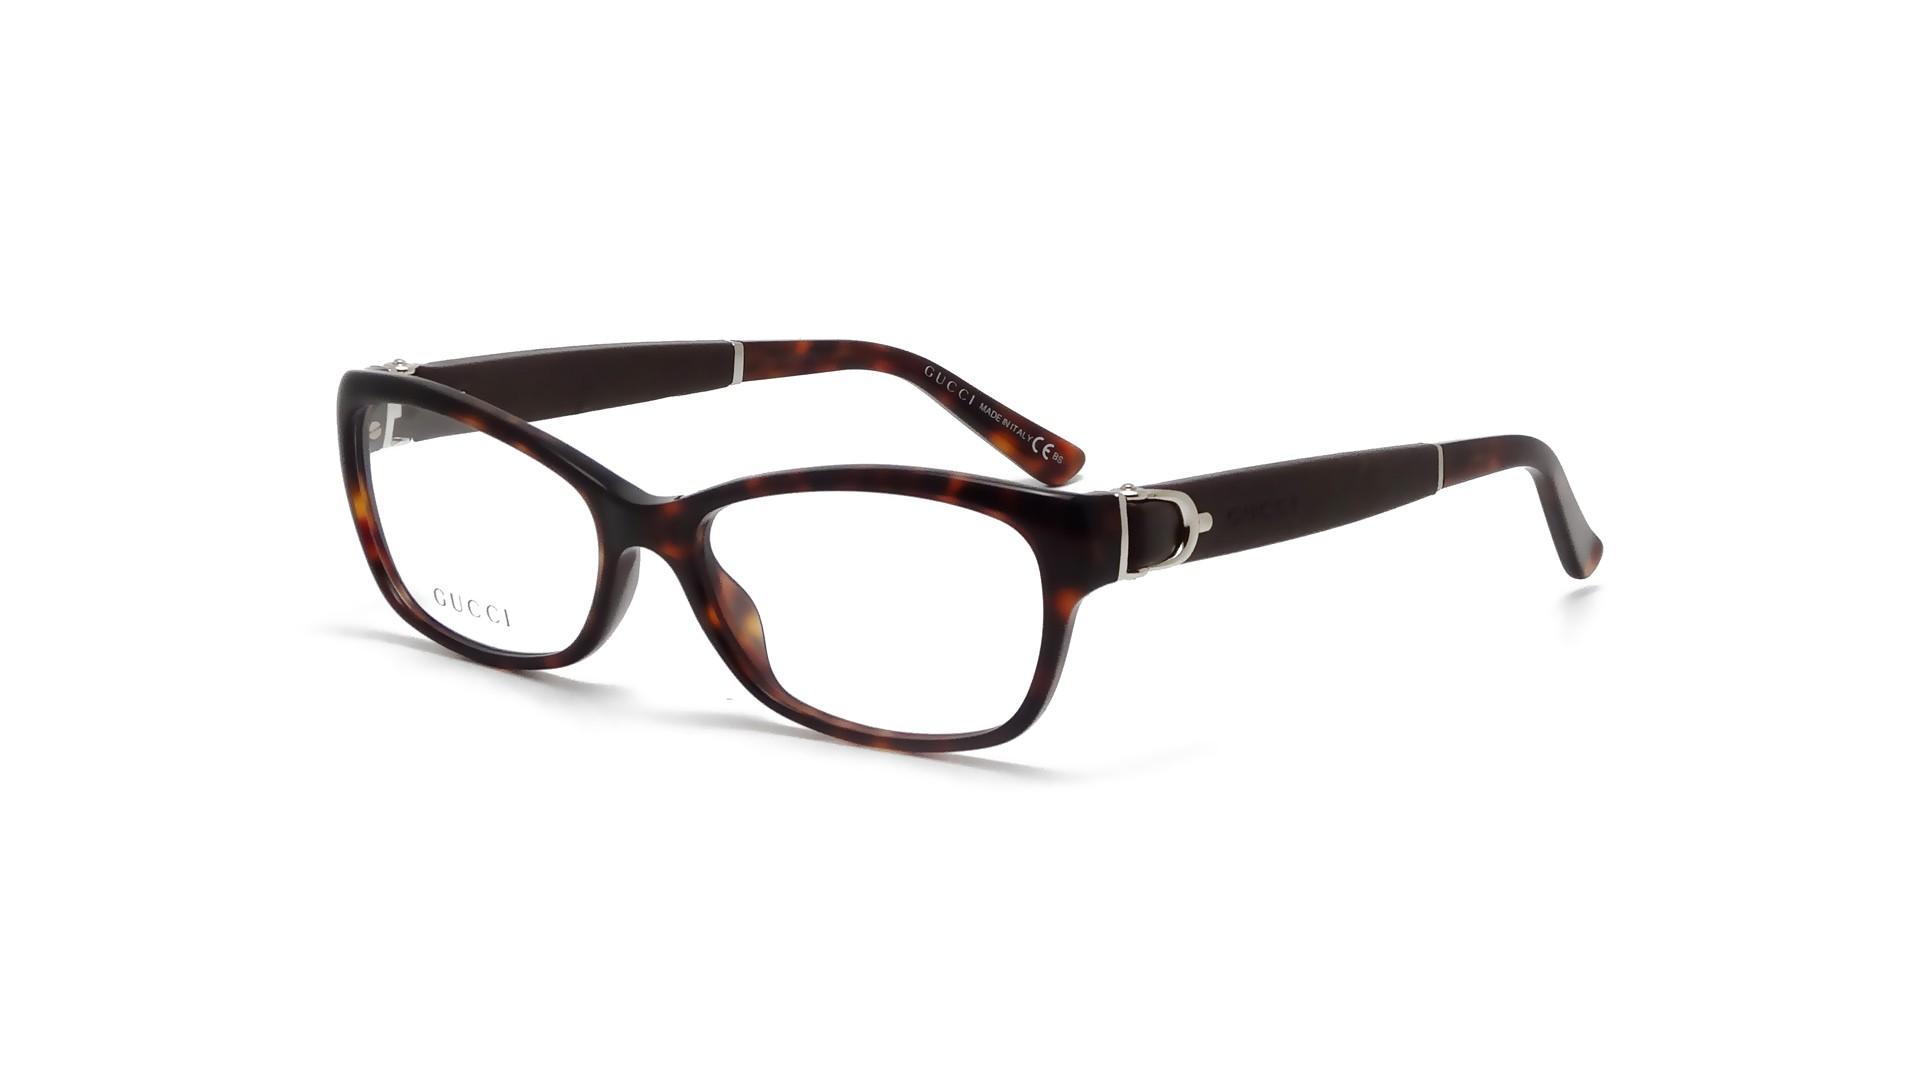 Glasses Frames Recto Or Quiapo : Eye glasses Gucci GG 3639 0XW Tortoise Medium